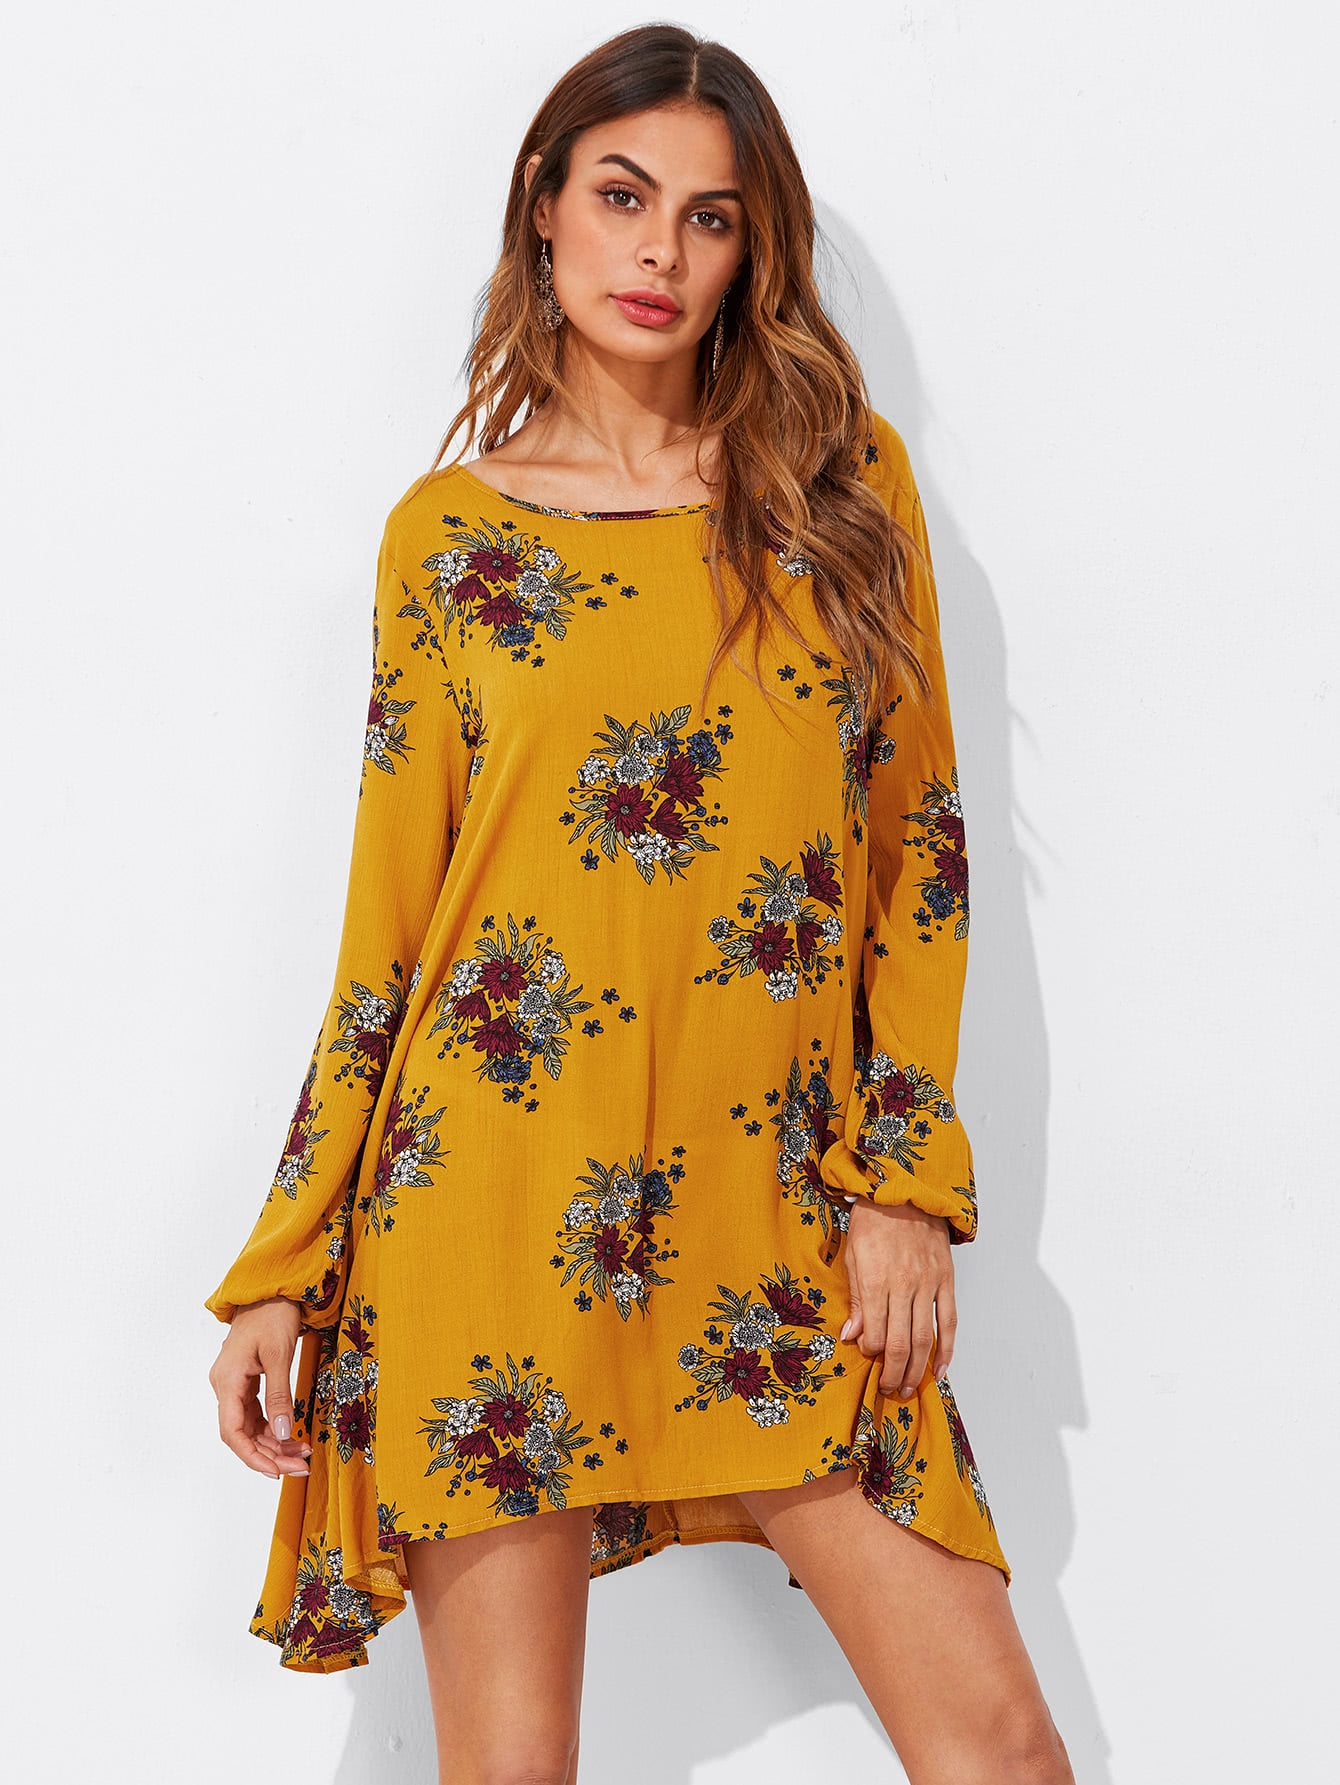 Floral Print Hanky Hem Shift Dress high slit hanky hem metallic halter dress